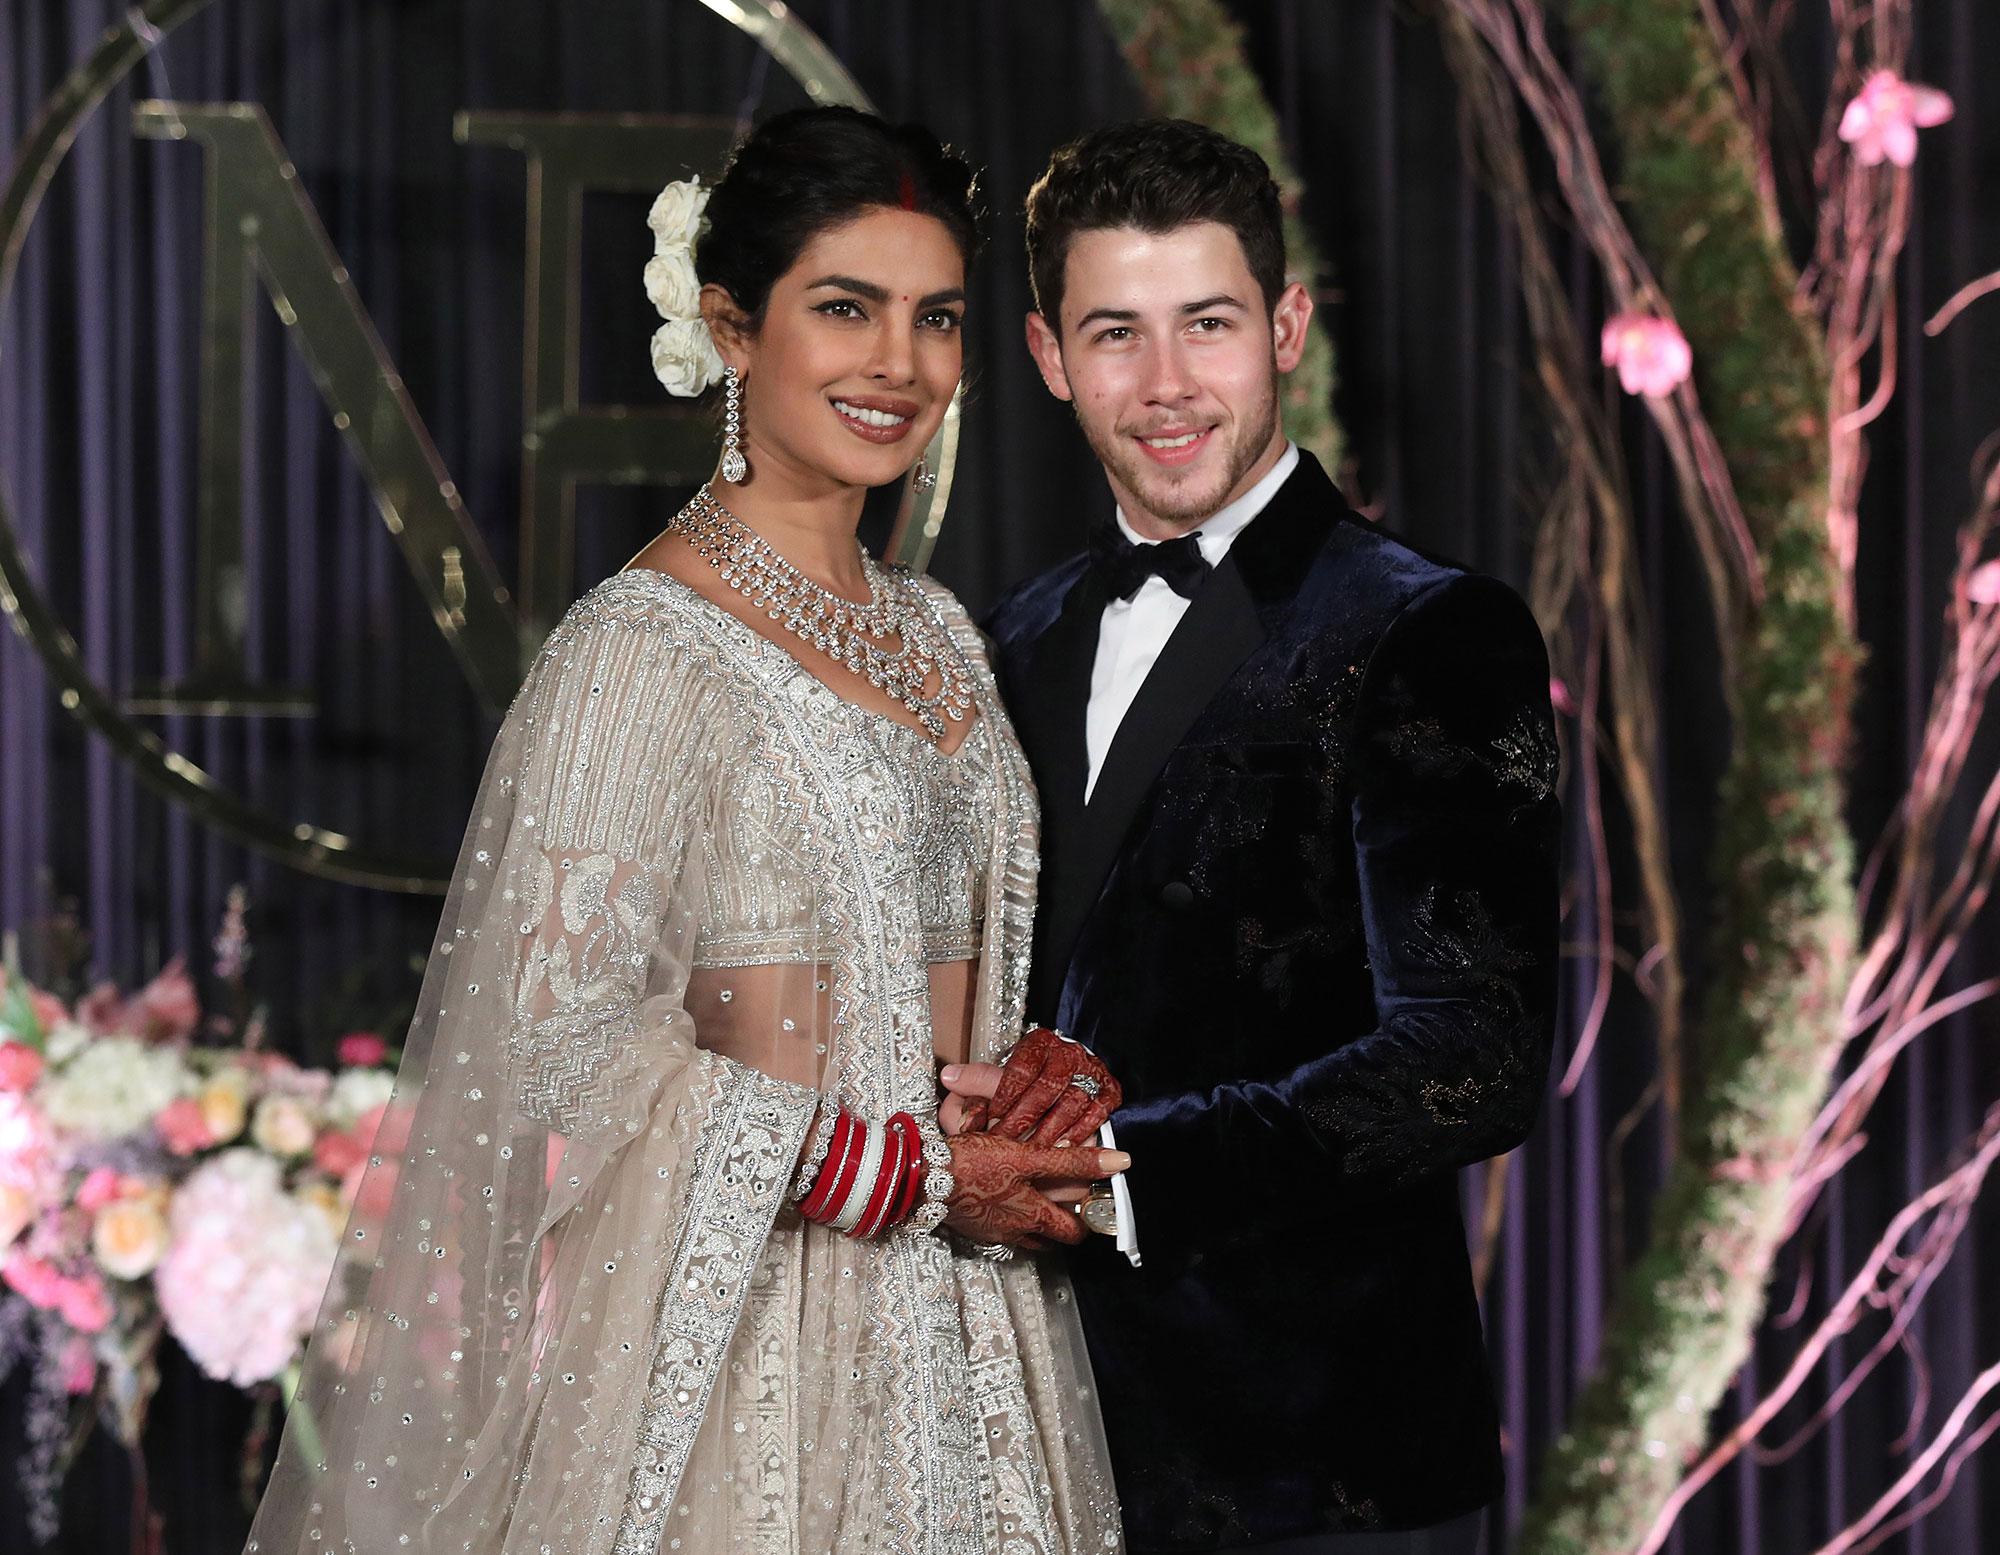 Nick Jonas reveals his favorite moment from his lavish wedding with Priyanka Chopra